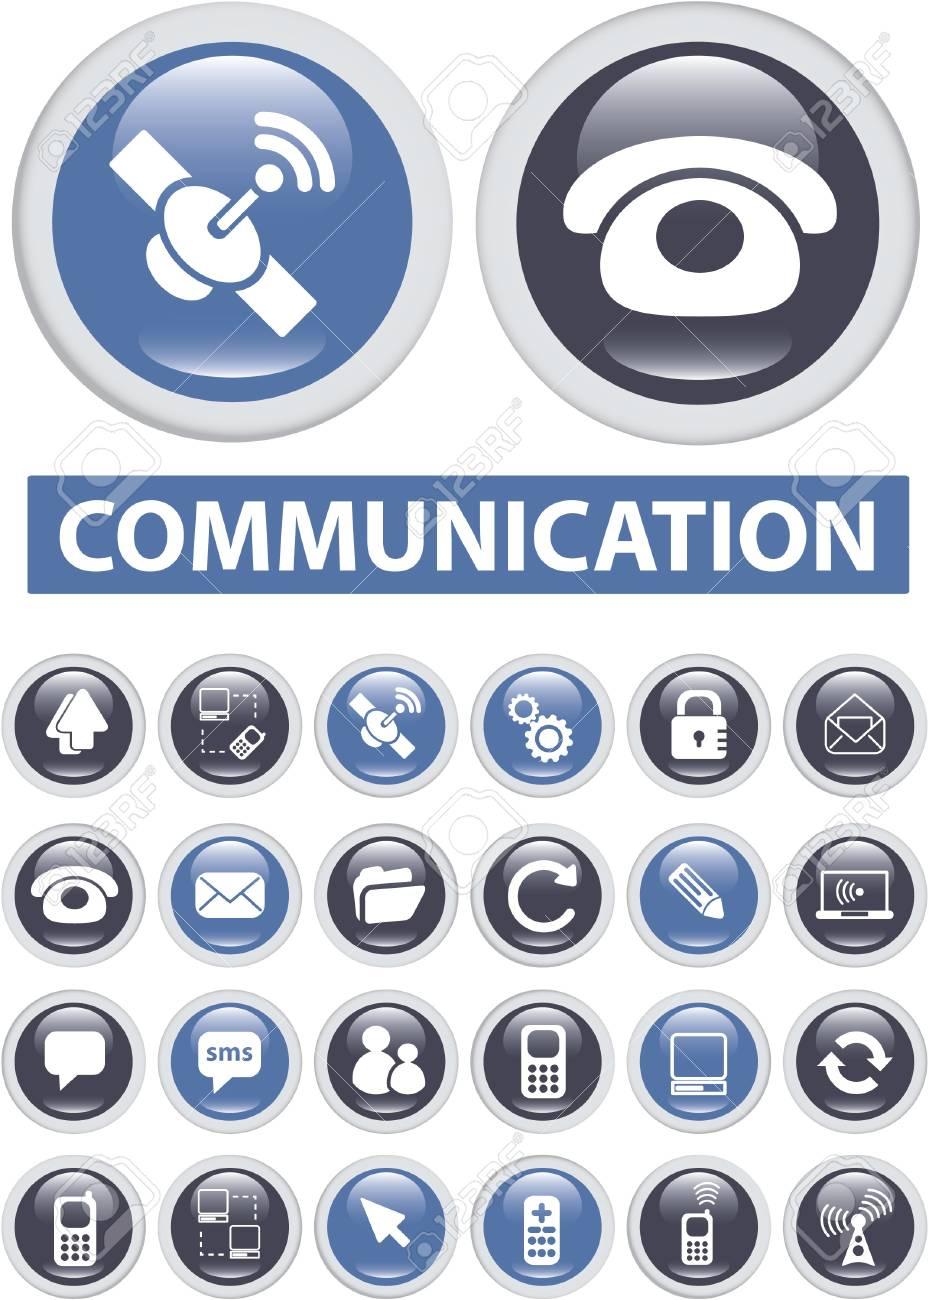 communication buttons Stock Photo - 8905002